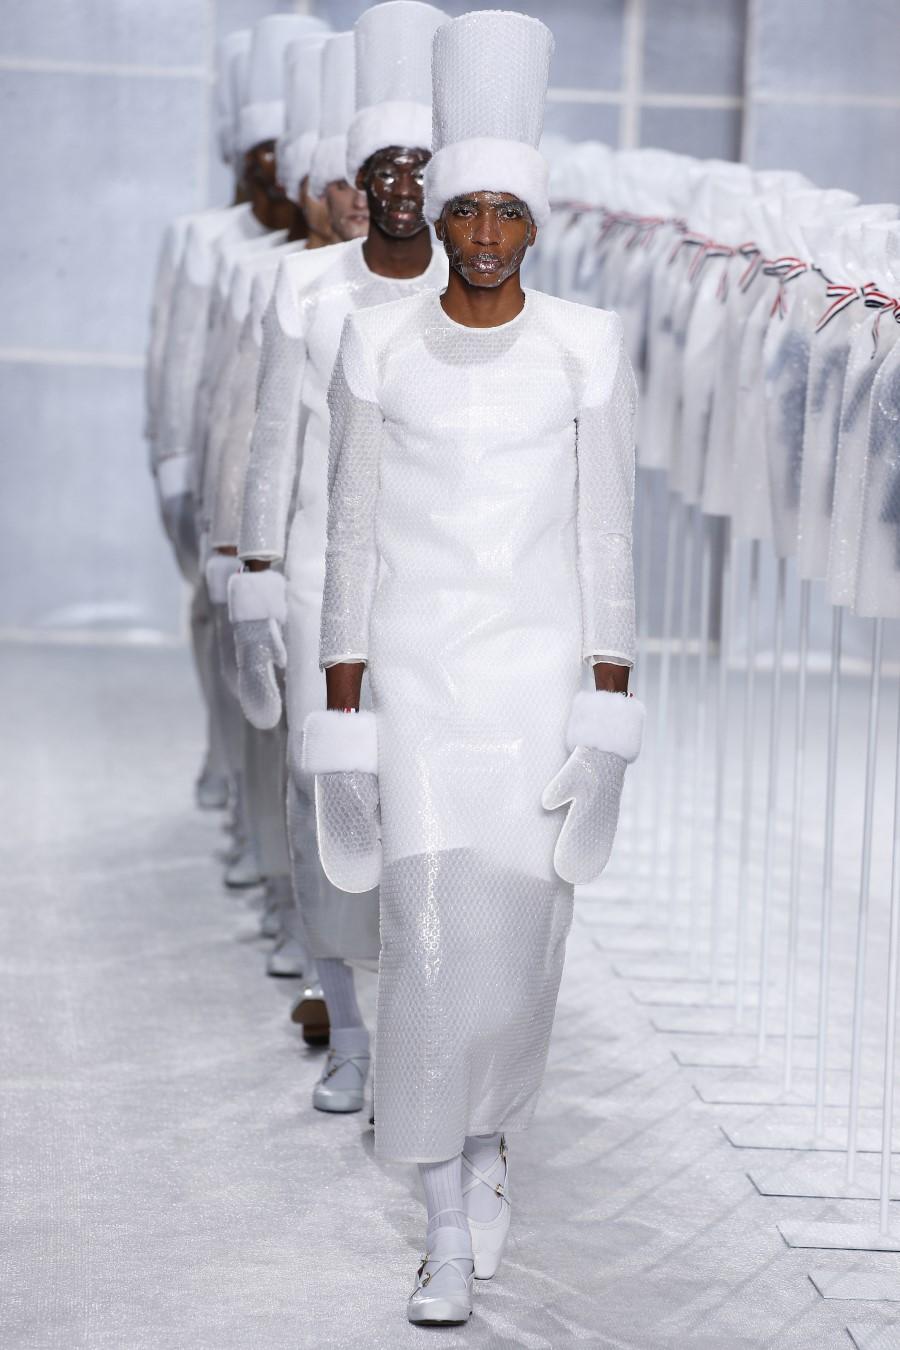 Thom Browne Automne Hiver 2019 Paris Fashion Week